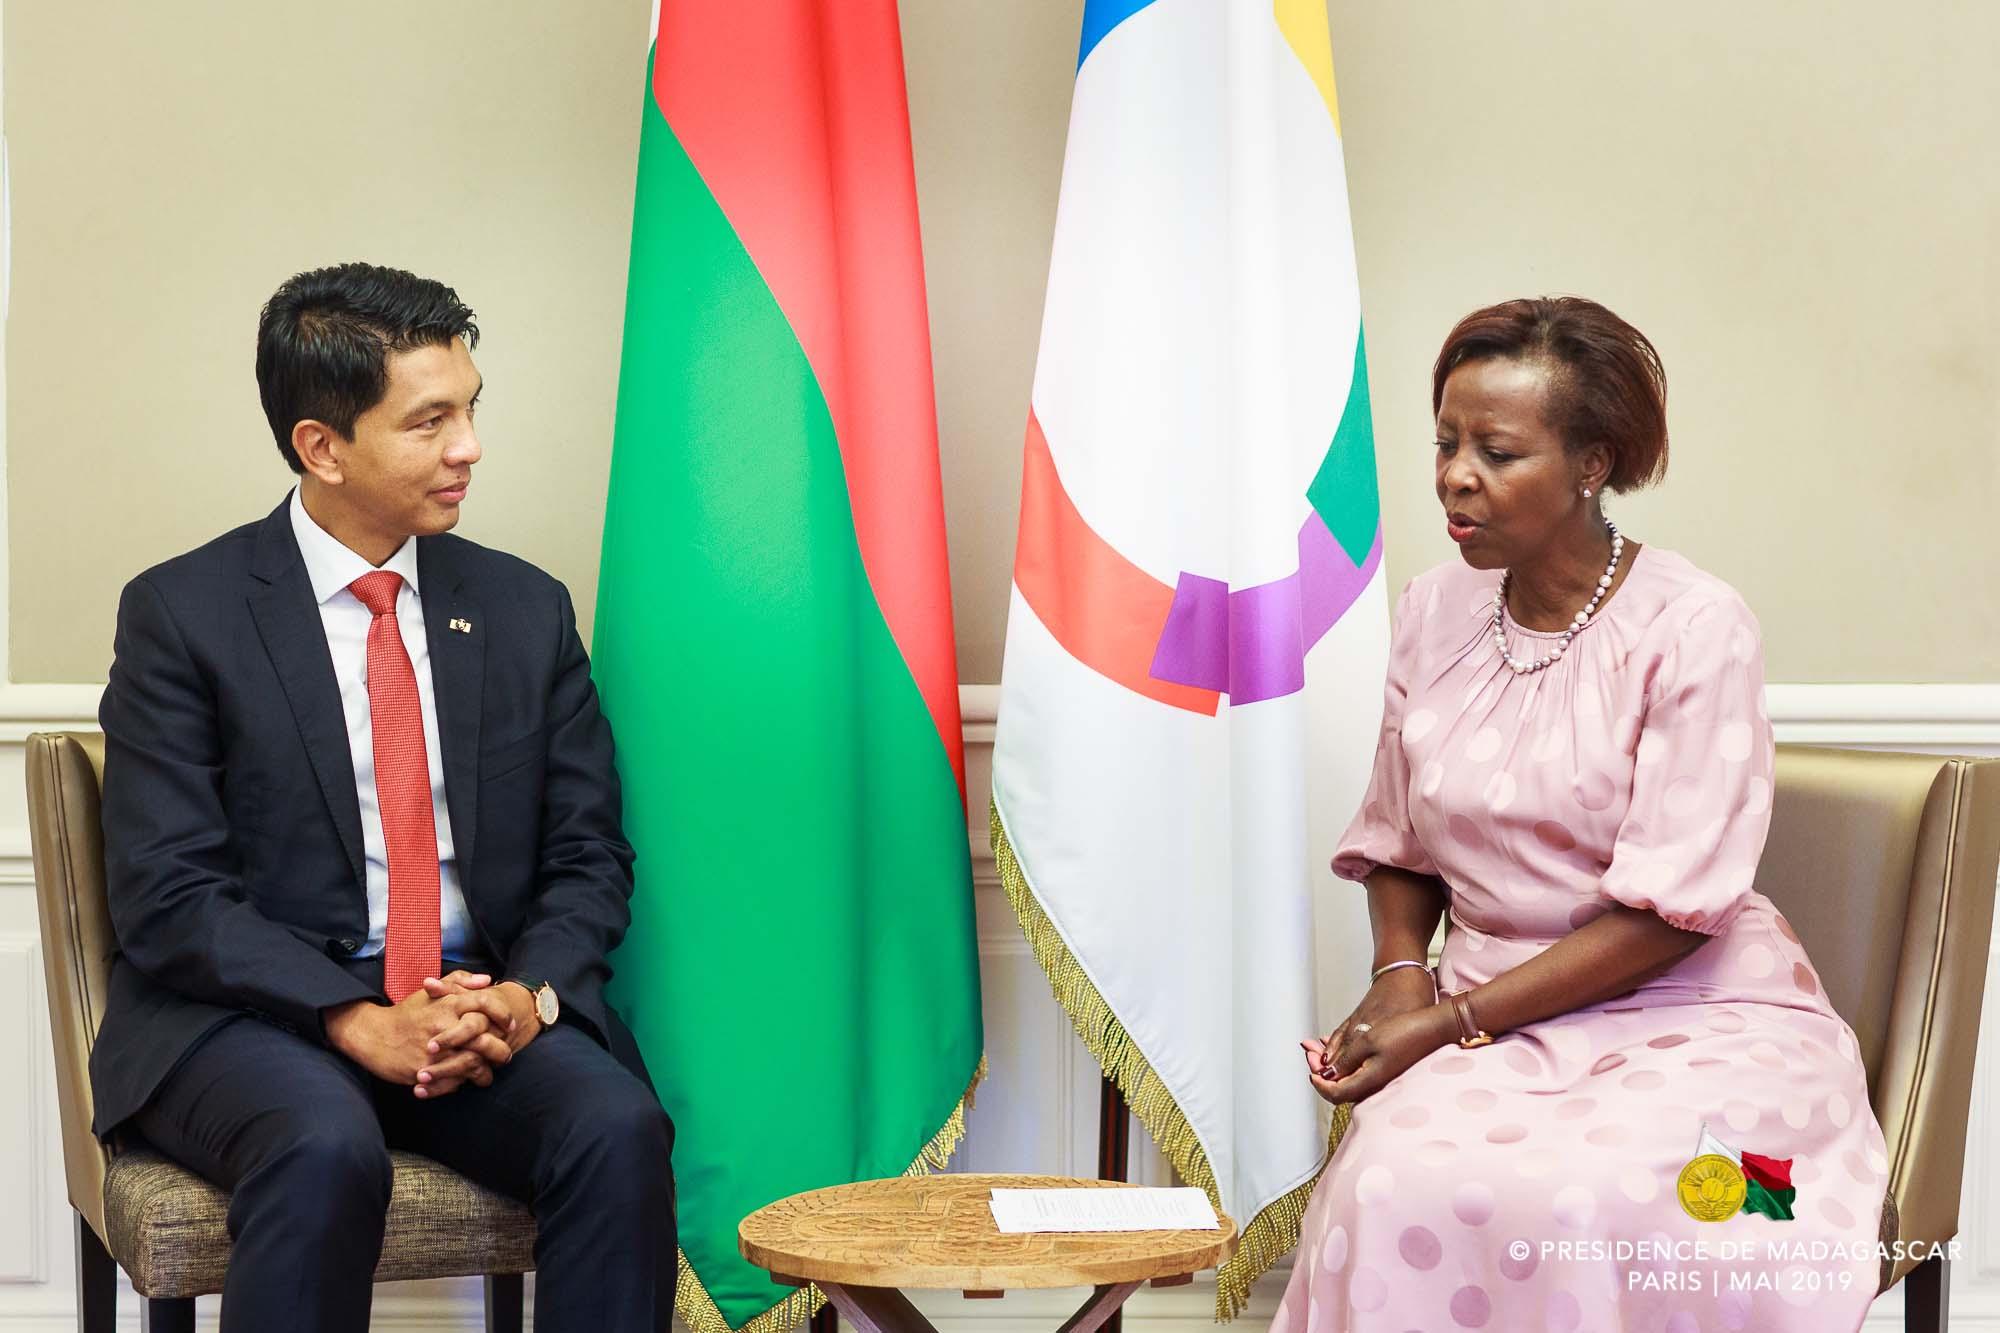 Andry Rajoelina et Louise Mushikiwabo au siège de l'OIF, à Paris, le 28 mai 2019.